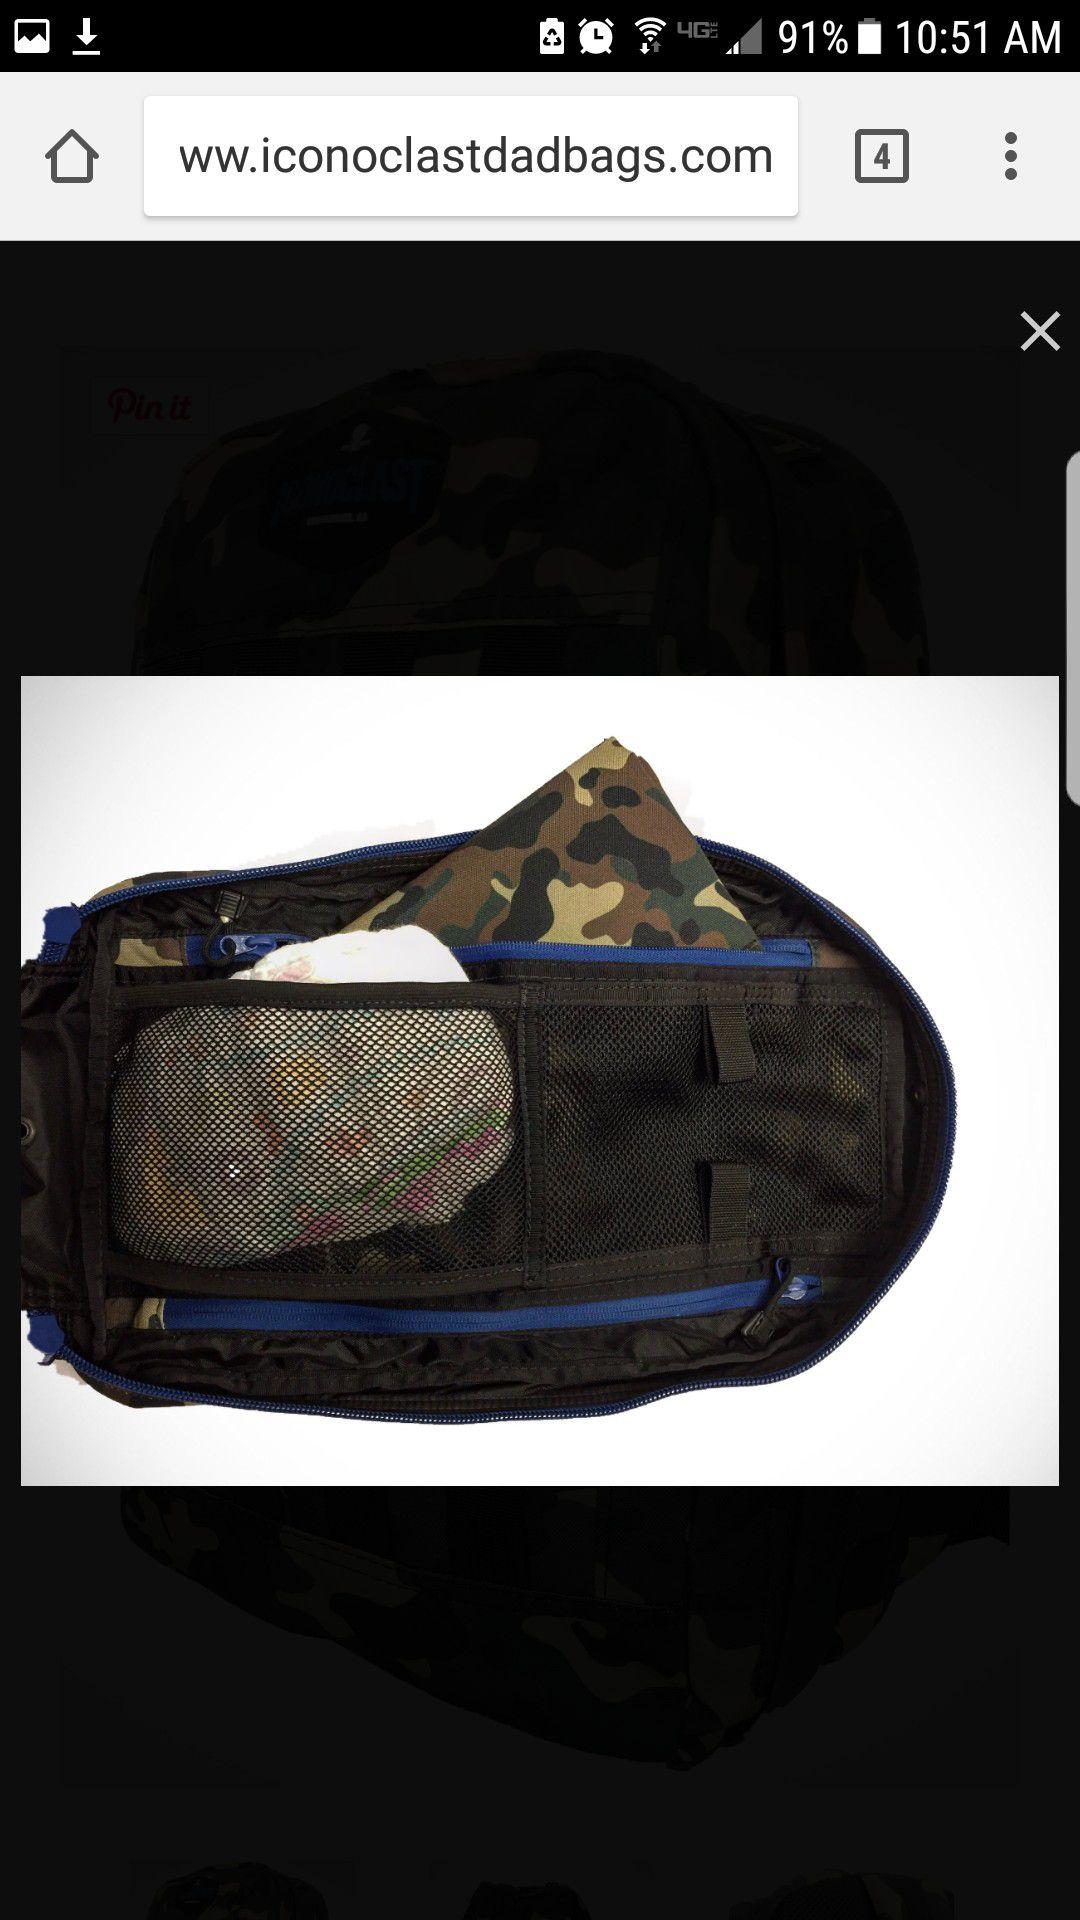 Iconoclast Dad Bag